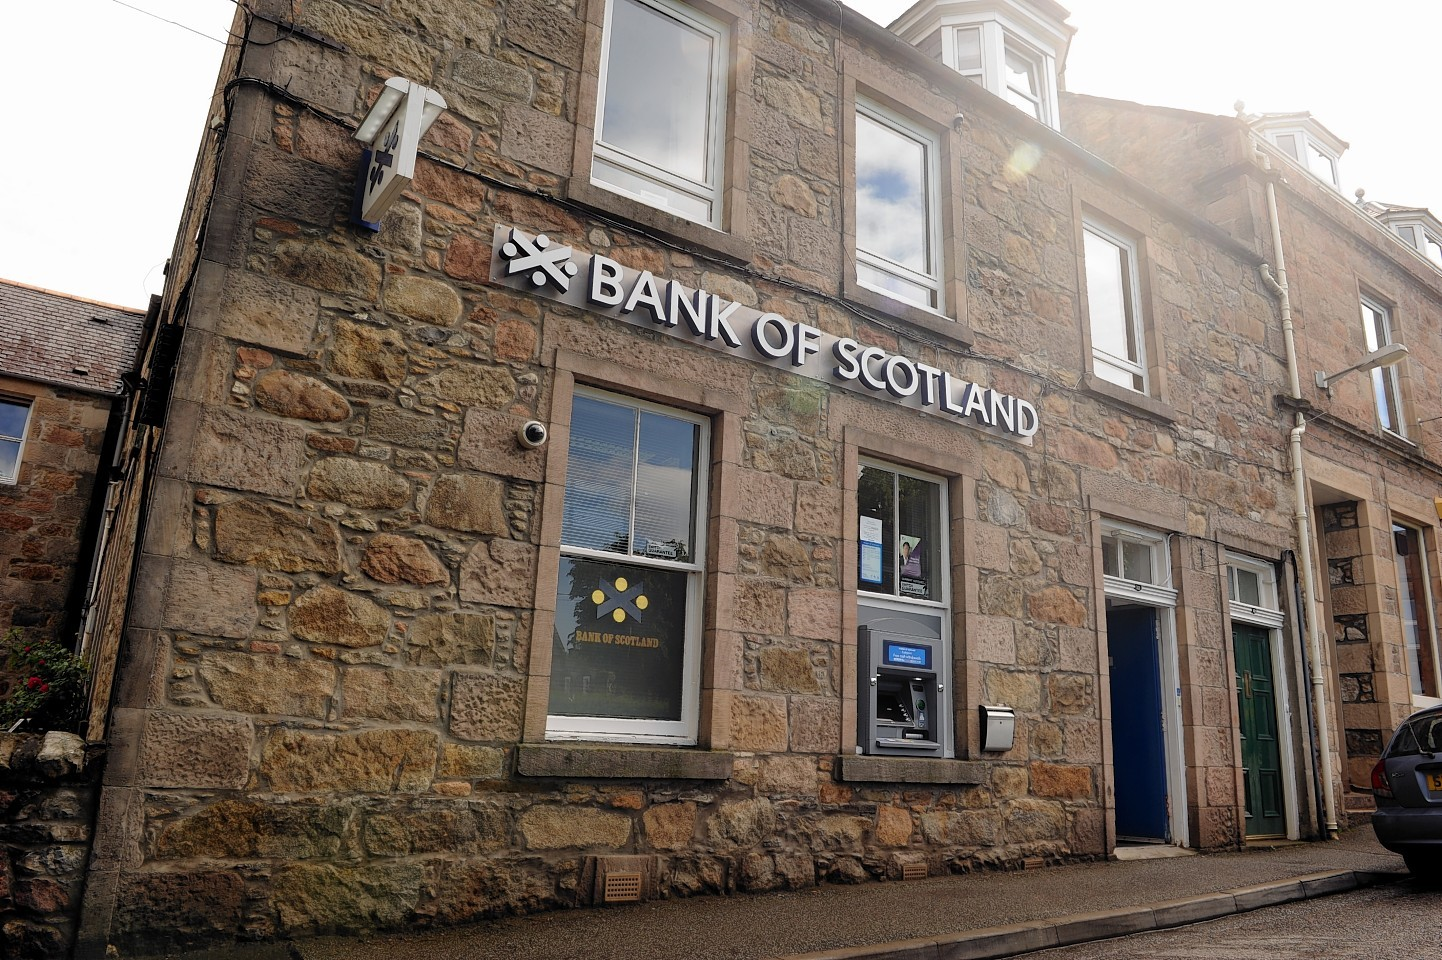 Bank of Scotland in Aberlour